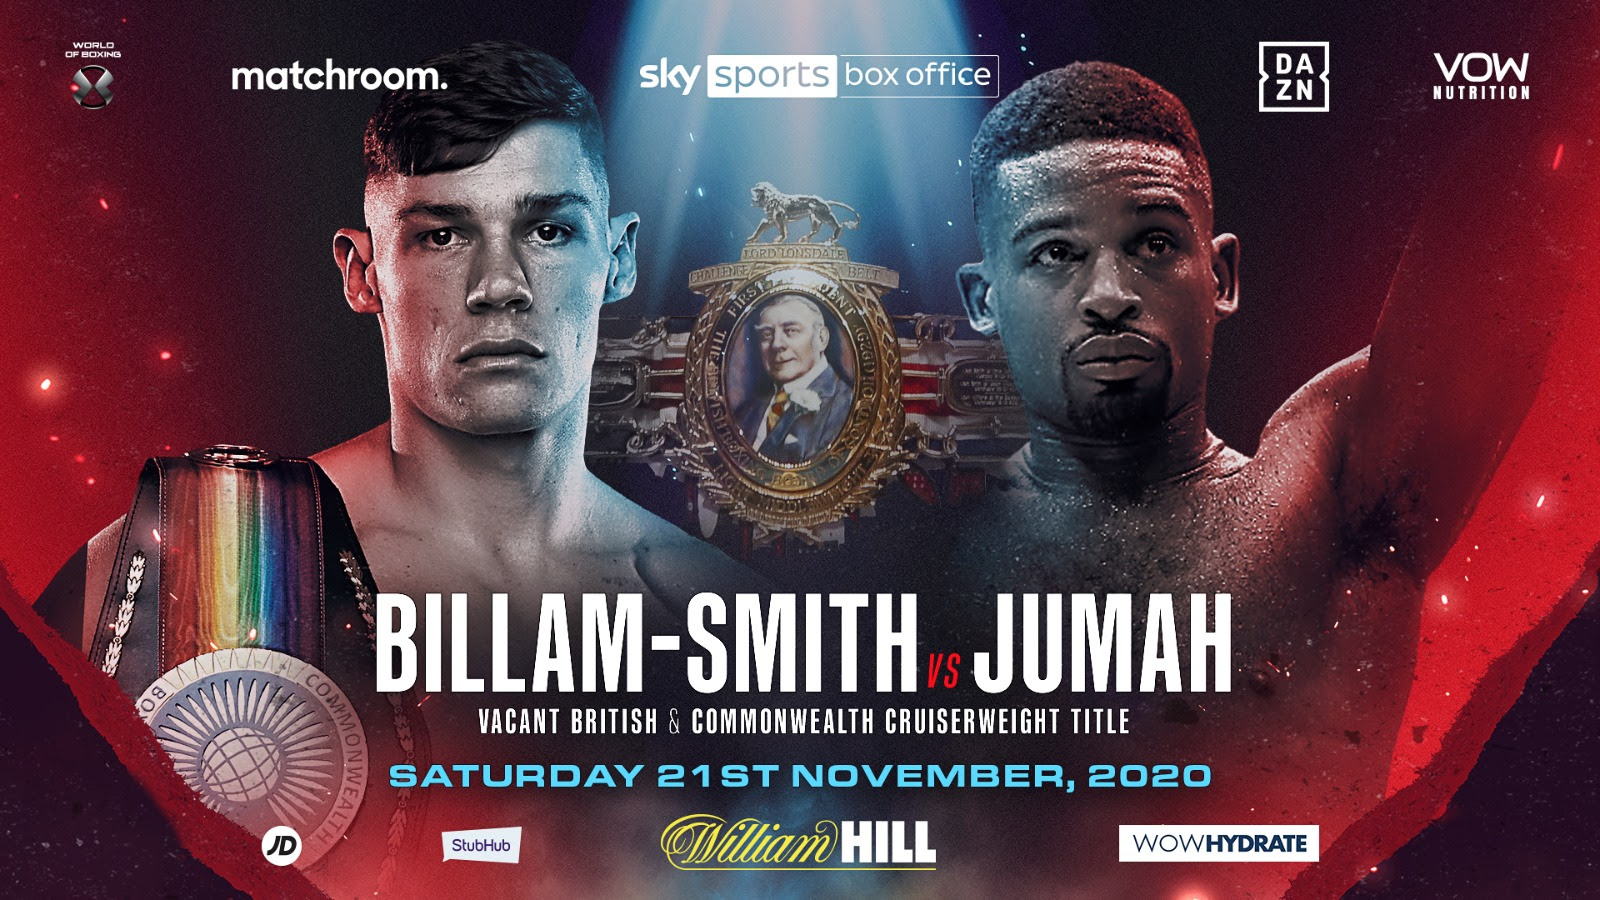 Chris Billam-Smith will take on Deion Jumah